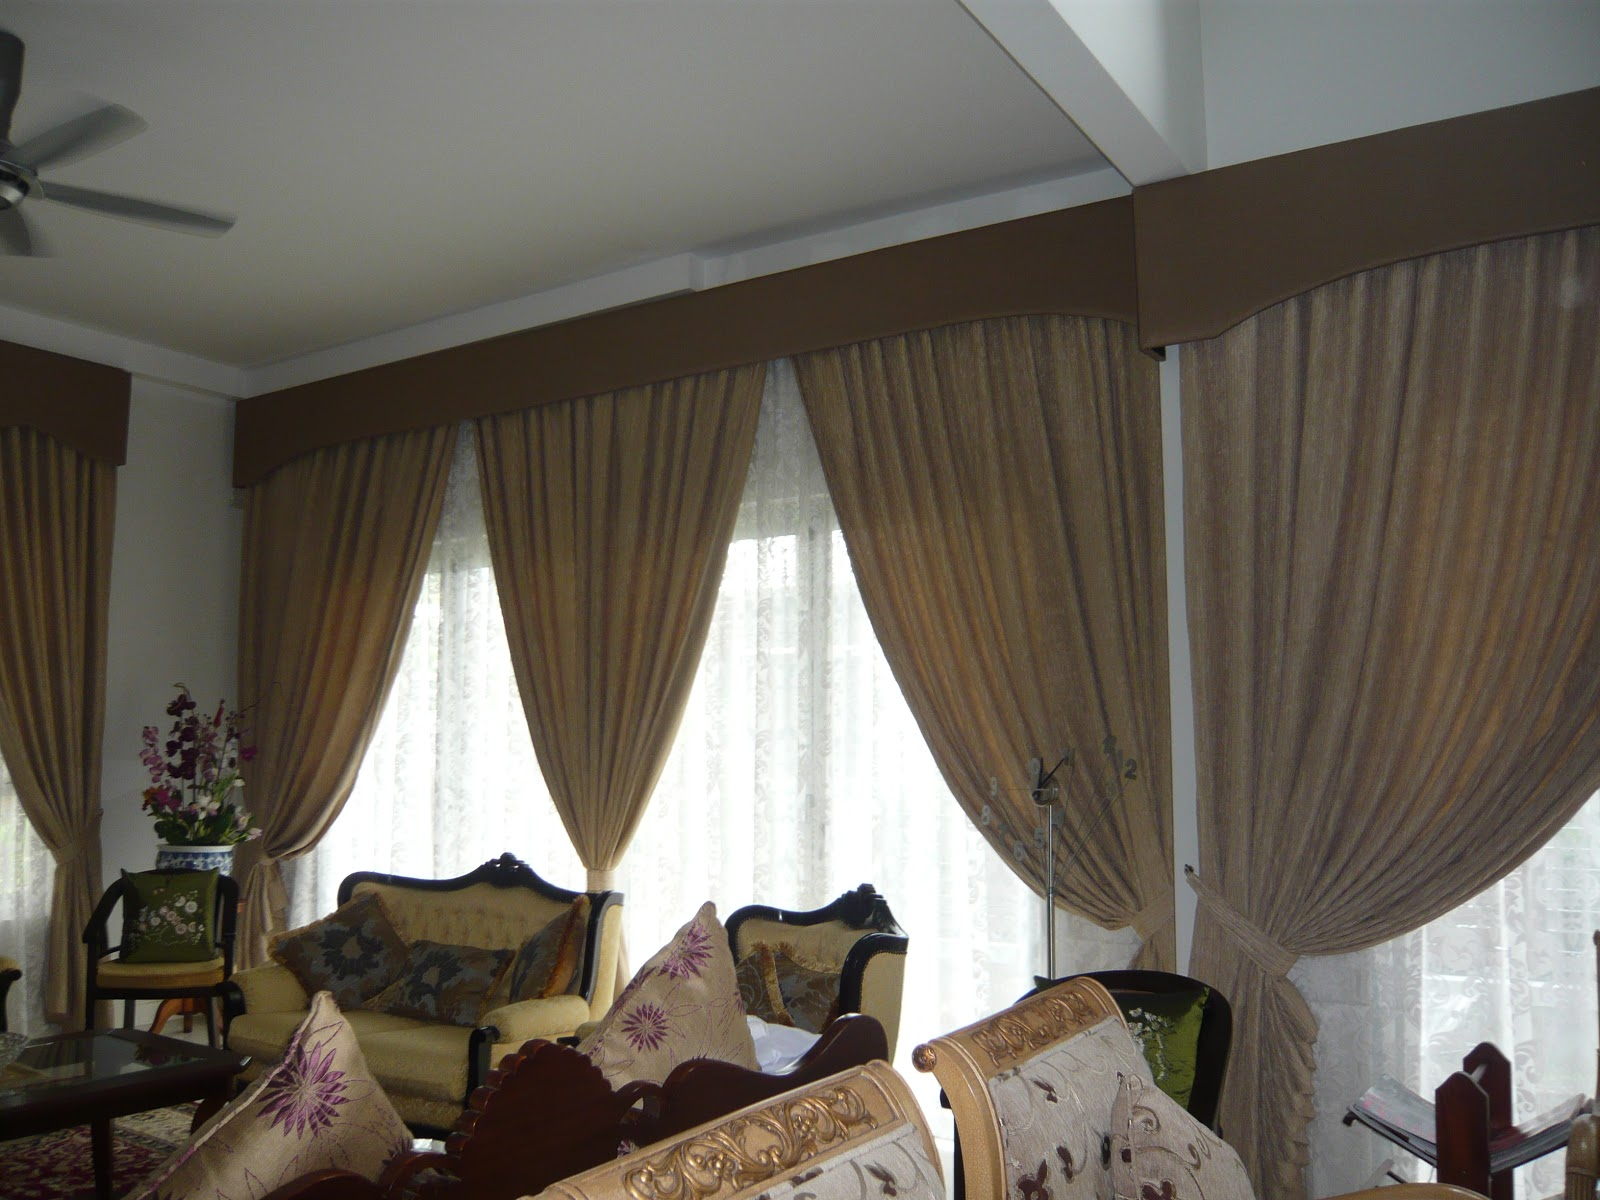 Repair Sofa Cushion Shah Alam Katy Scs Home Furnishings And Interior Design